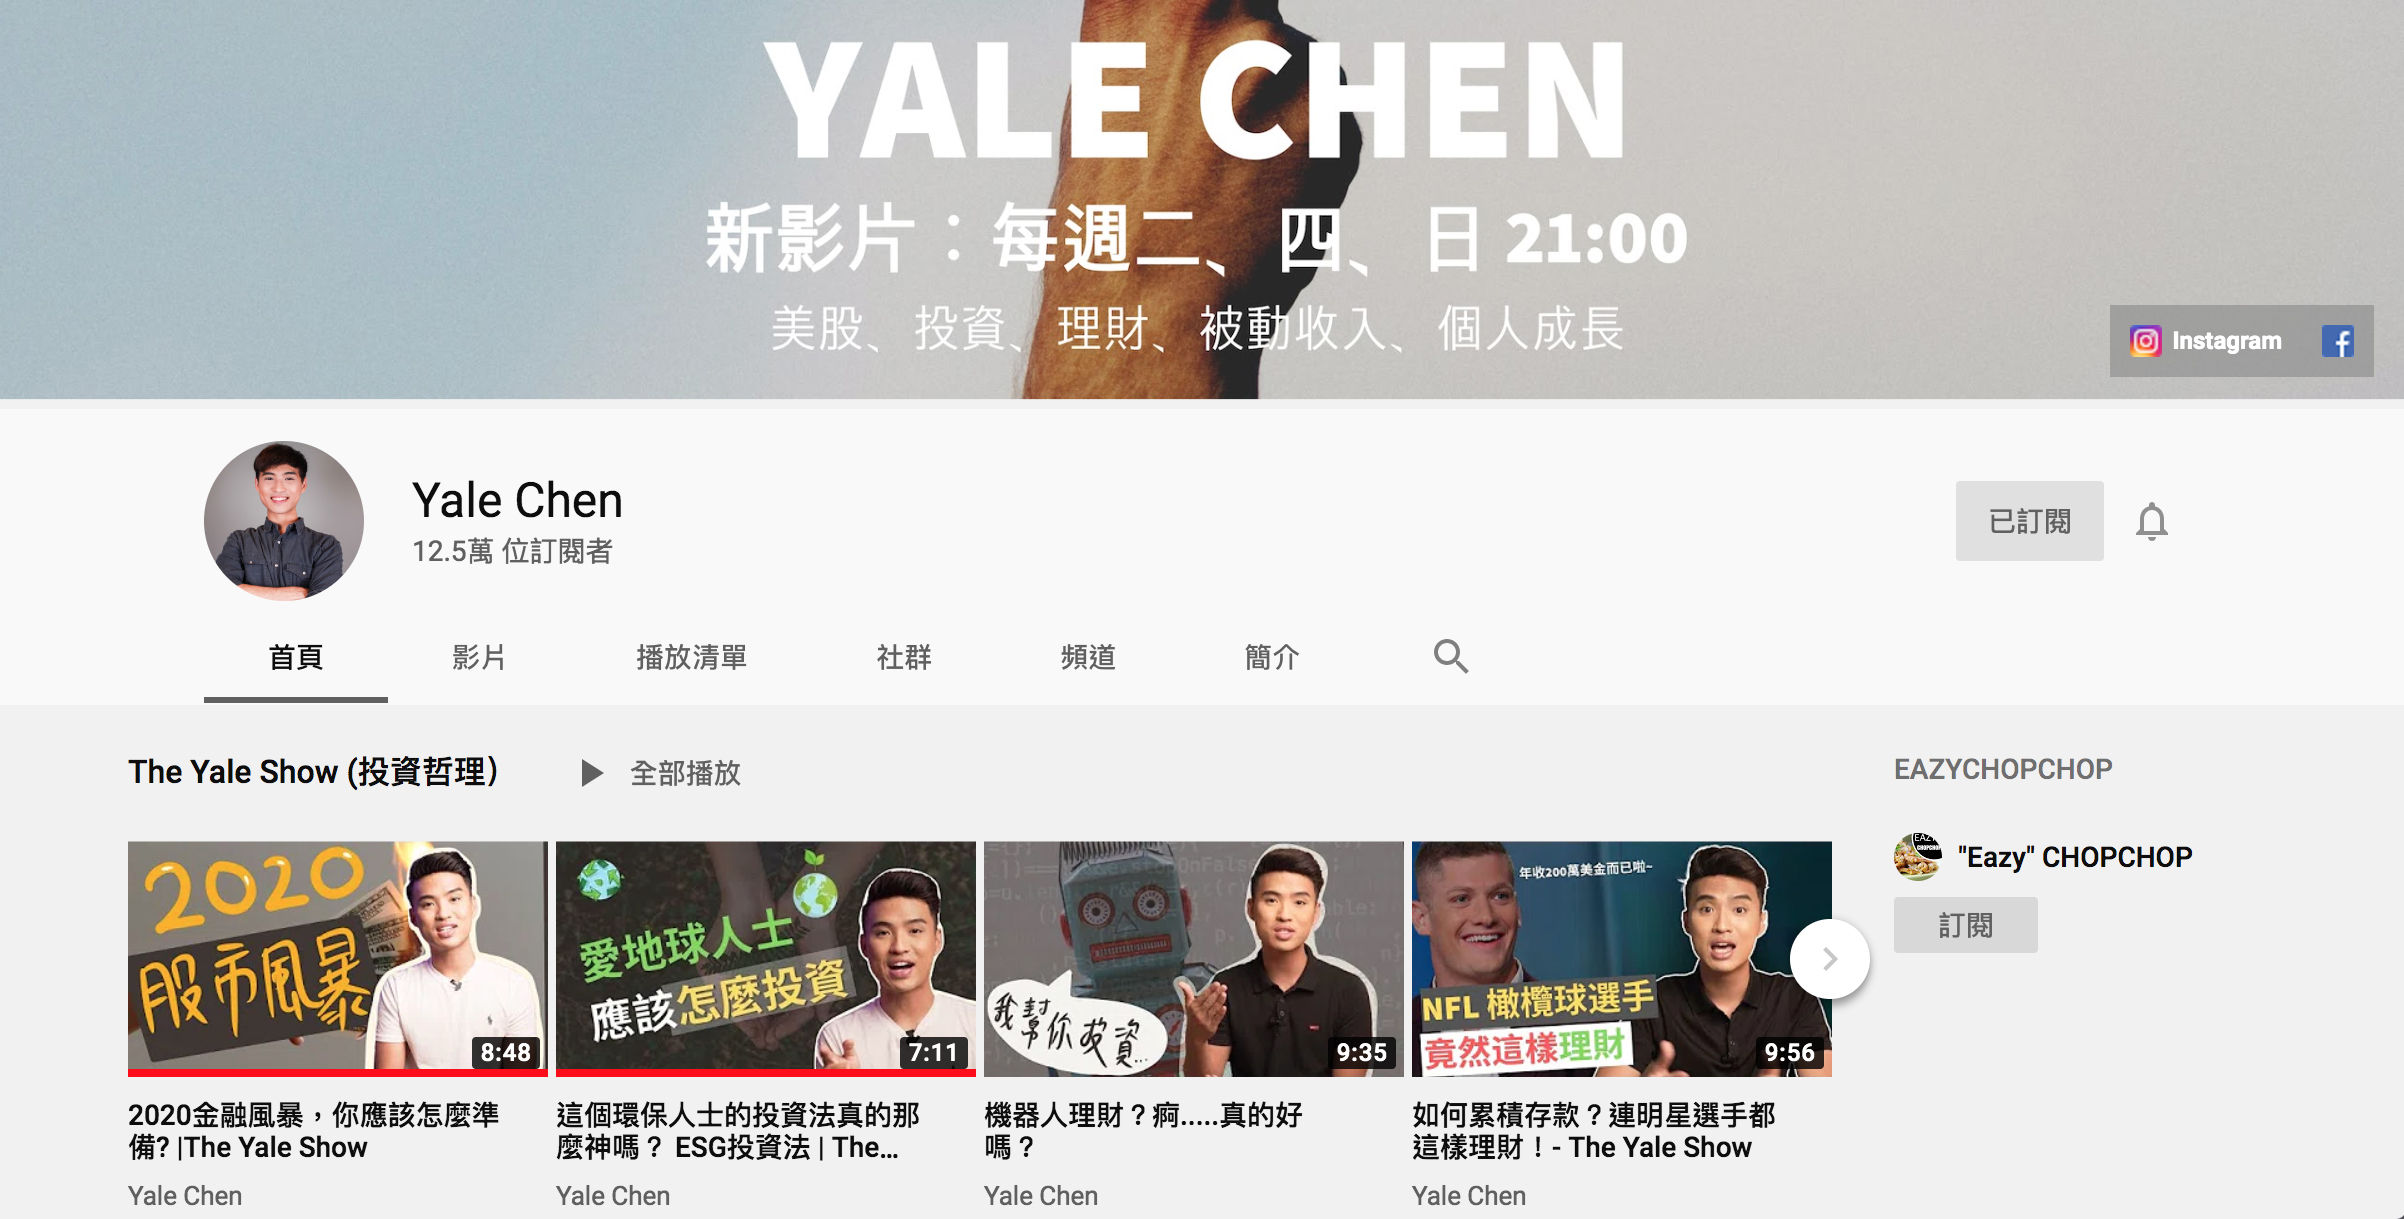 yale chen,美股投資